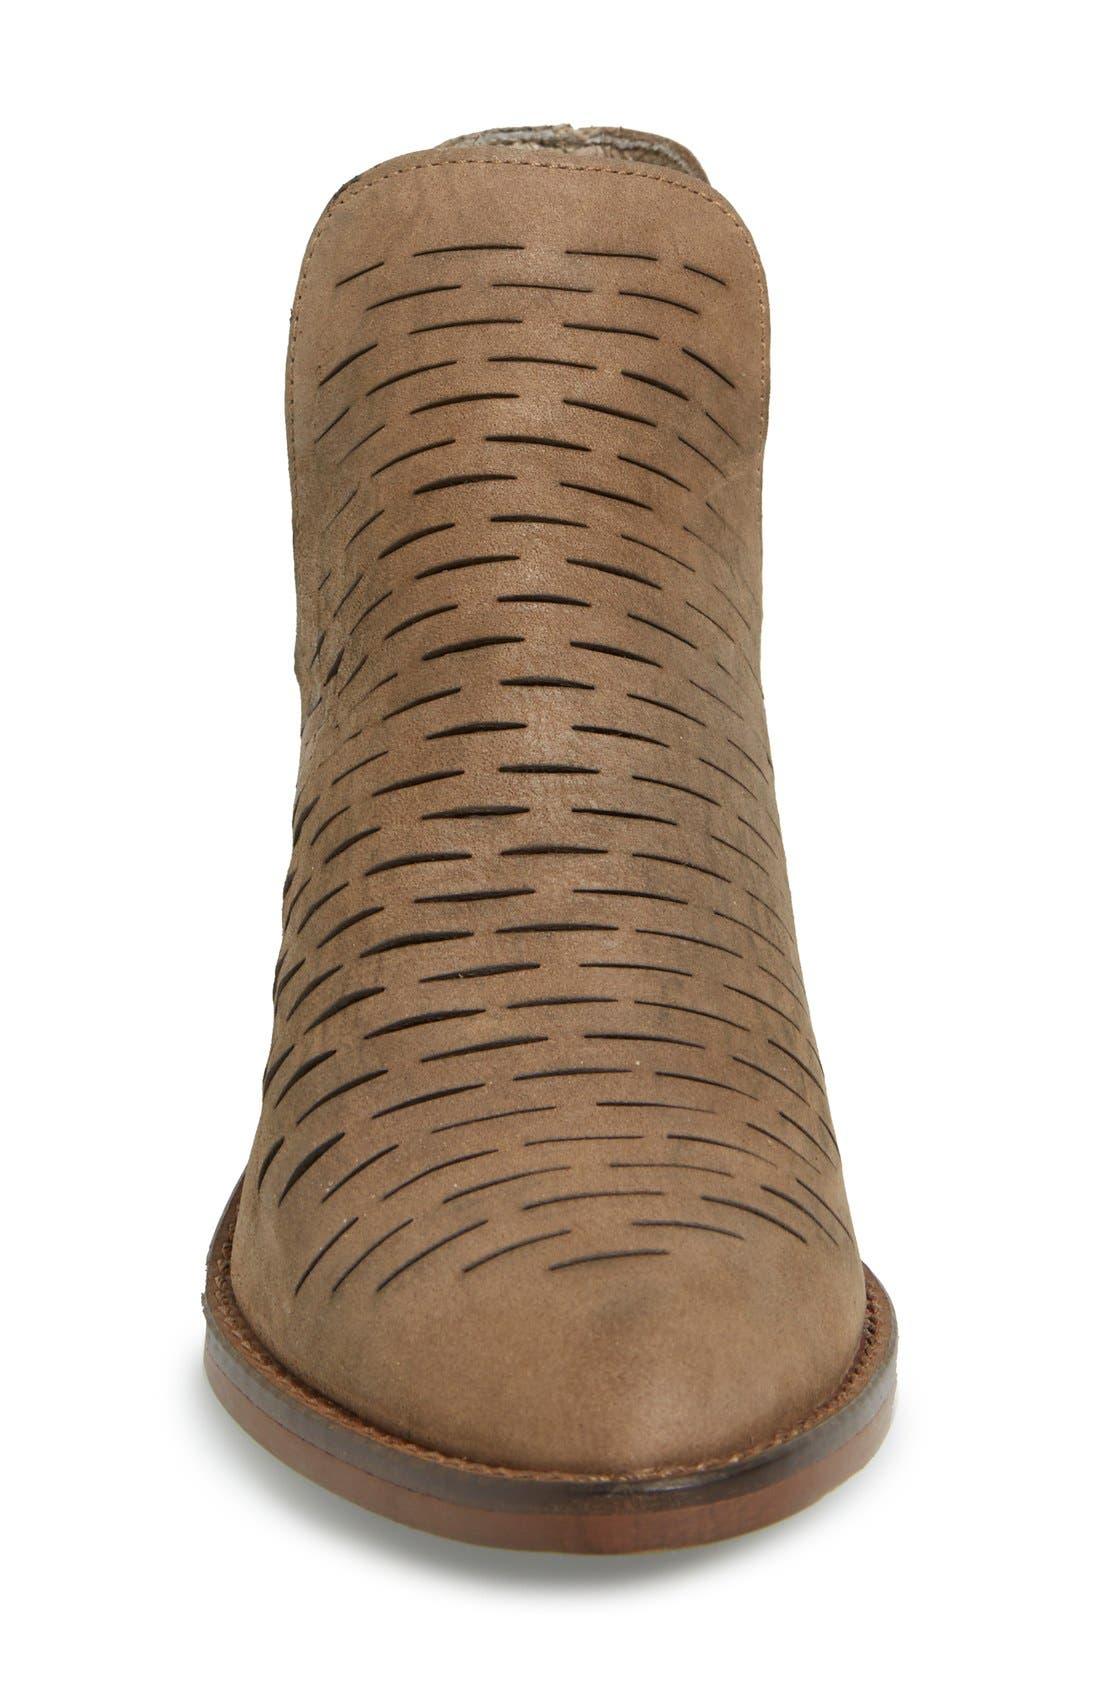 Alternate Image 3  - Steve Madden 'Arowe' Perforated Bootie (Women)